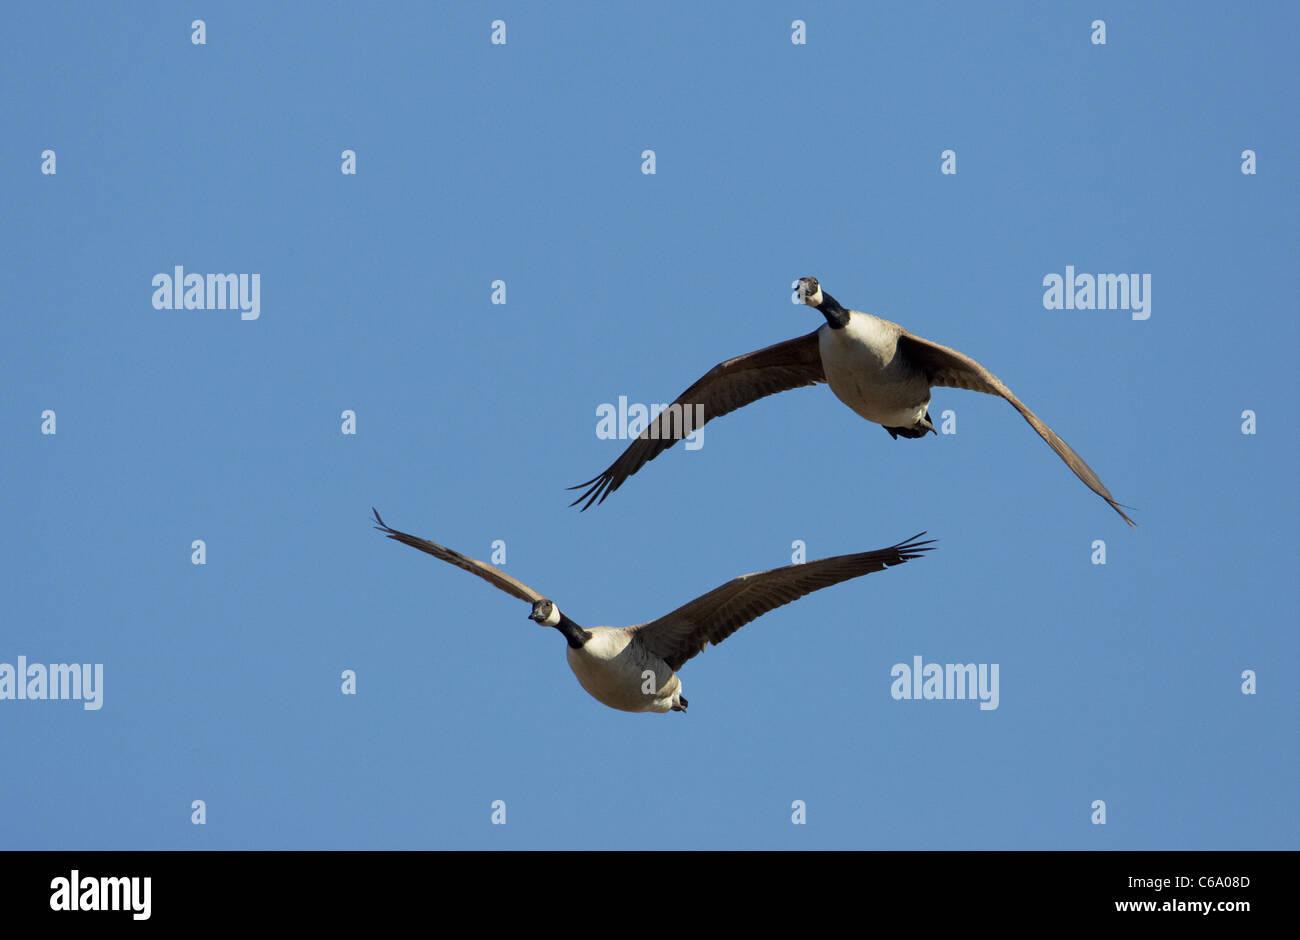 Canada Goose (Branta canadensis), pair in flight. - Stock Image